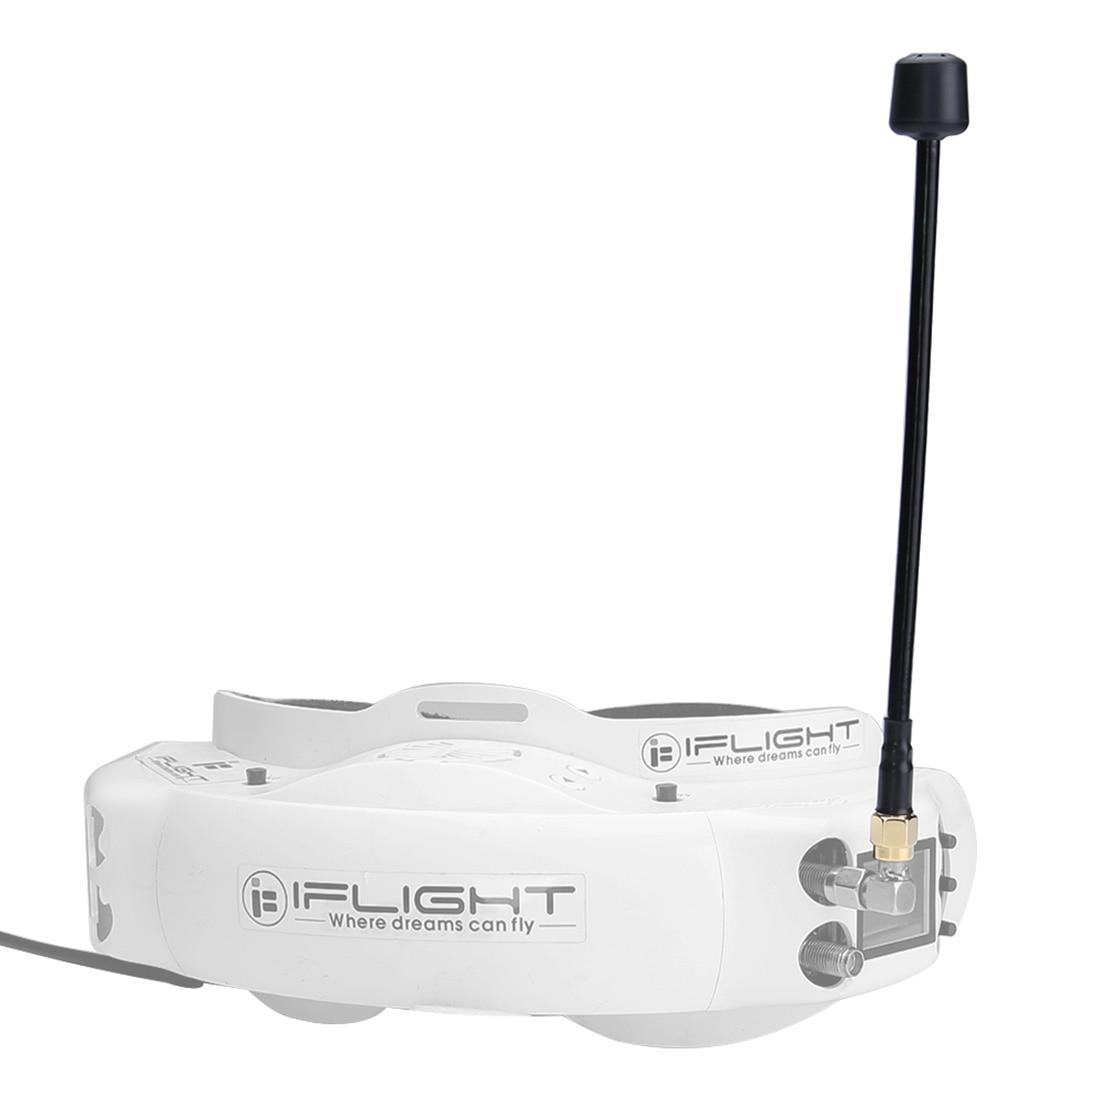 IFlight Albatross 5.8GHz 3Dbi 5000-6000MHz 150mm RHCP / LHCP RP-SMA / SMA FPV Antenna For Fatshark EV200D FPV Goggles FPV Drone